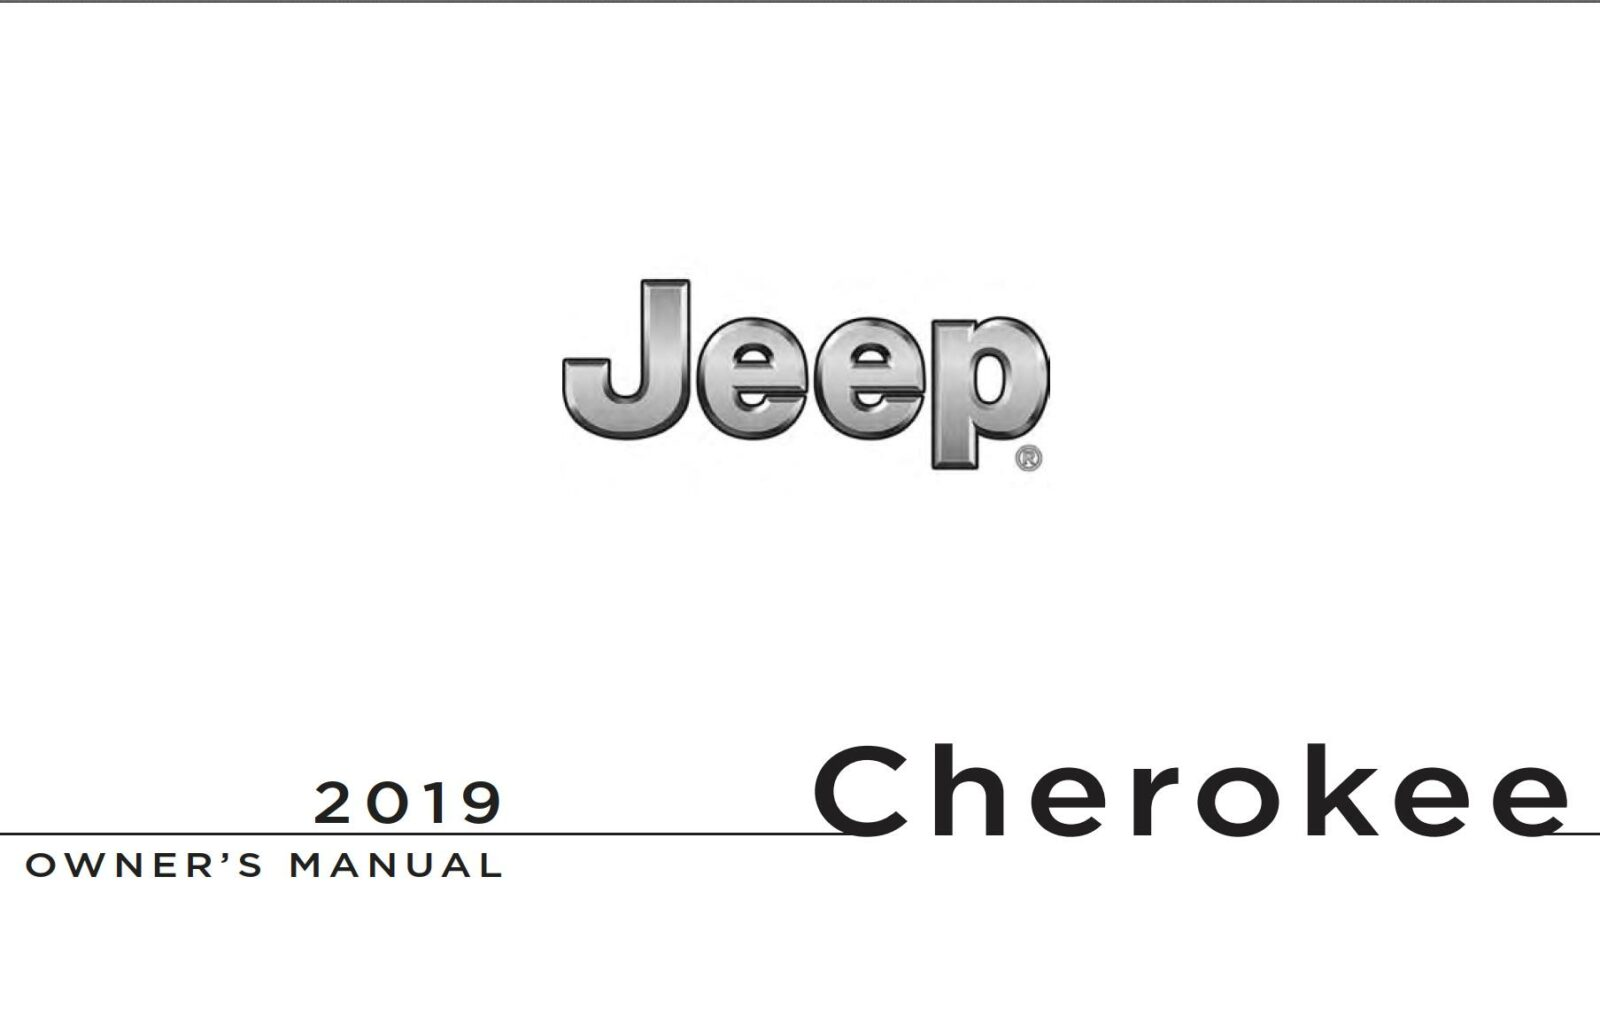 Jeep Cherokee 2019 Owner's Manual